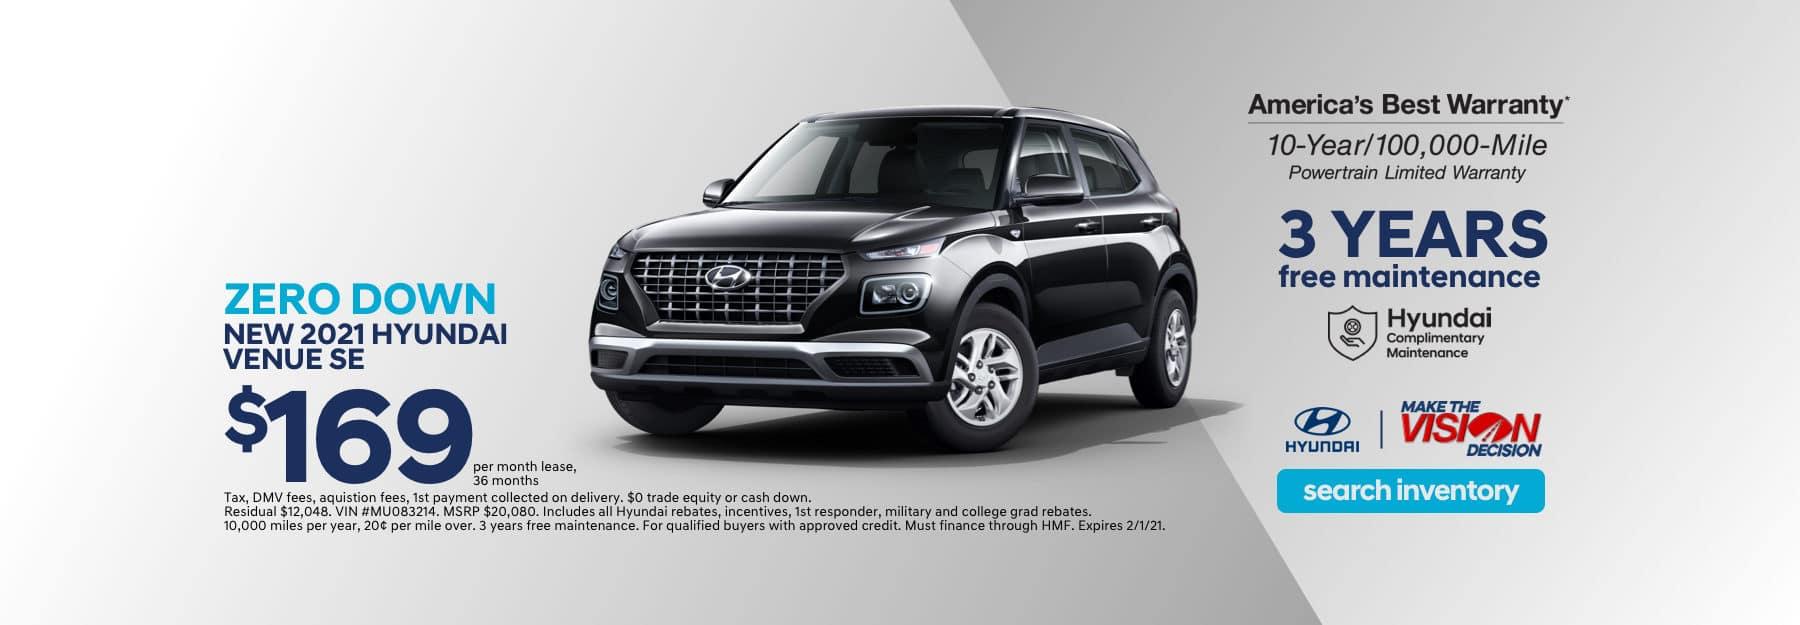 Vision-Hyundai-Sliders-0106-Venue